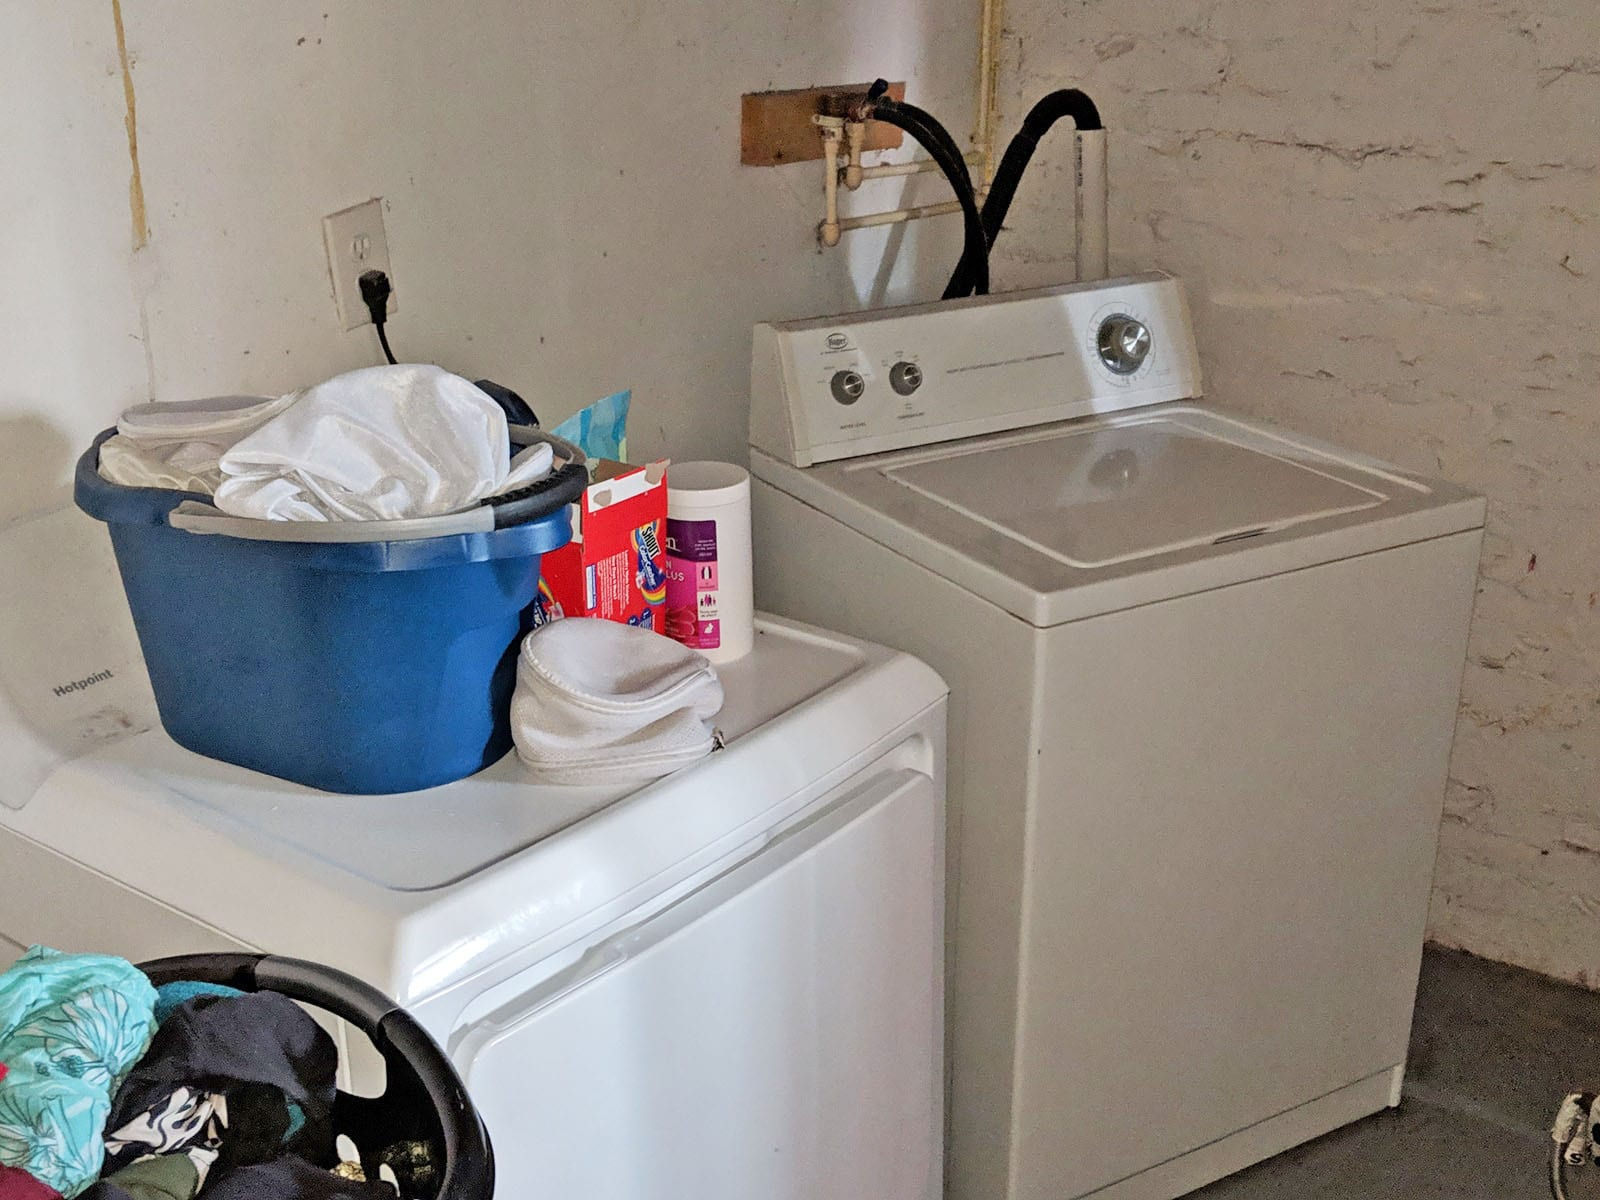 117 2302 Laundry